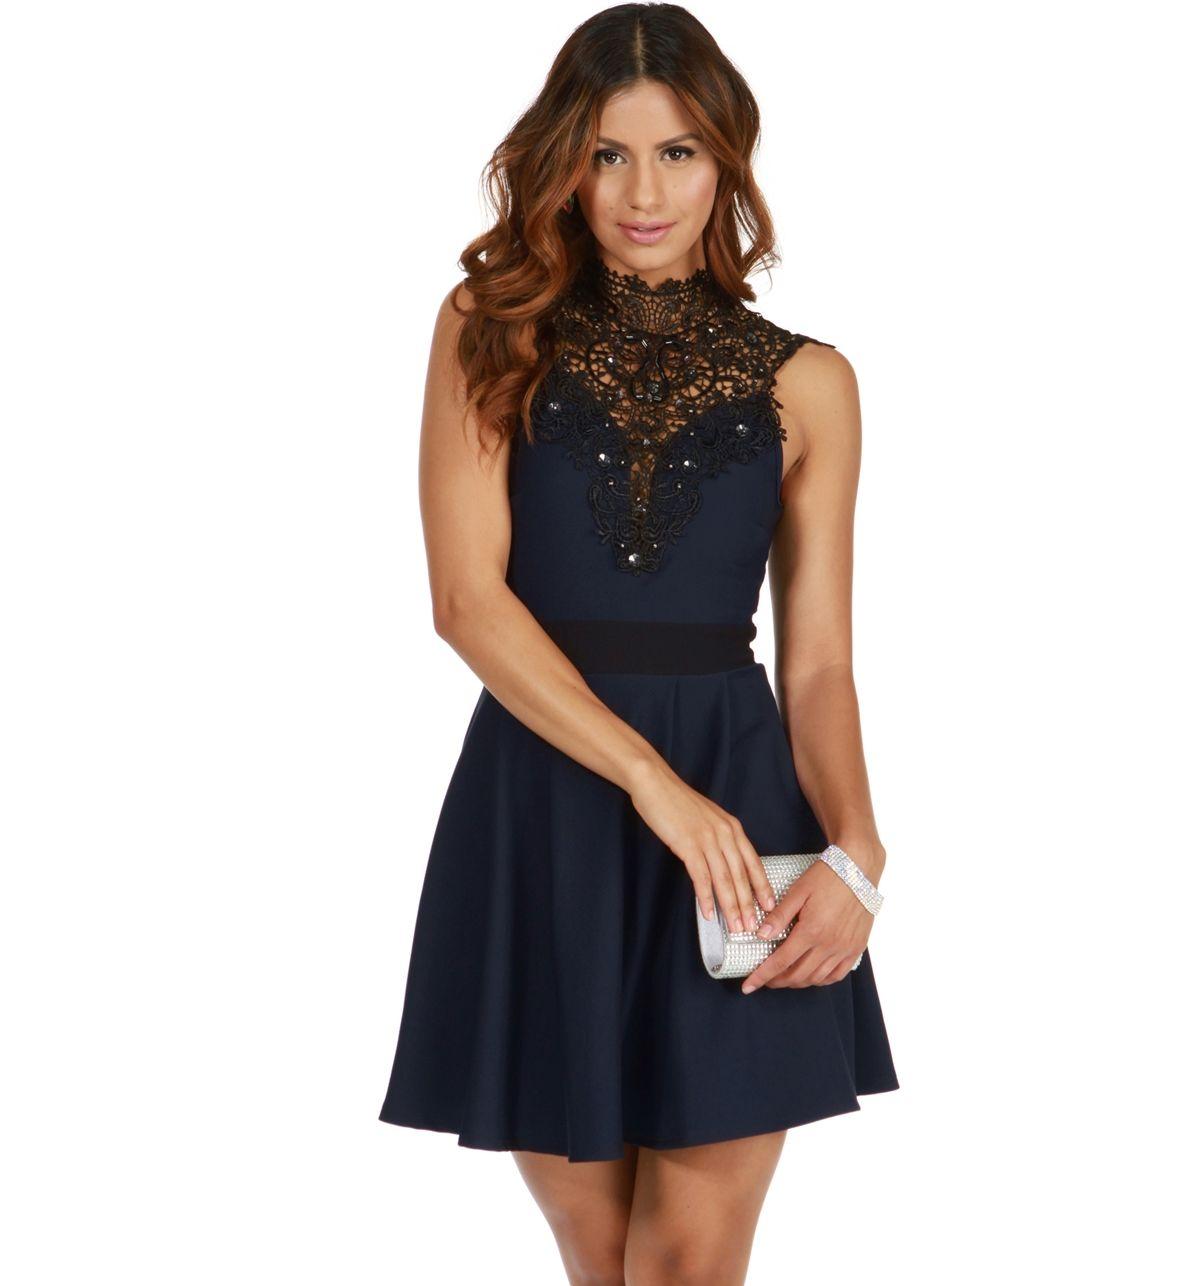 Navy Lovely Skater Dress Lace Skater Dress Skater Dress Dress Up [ 1286 x 1180 Pixel ]